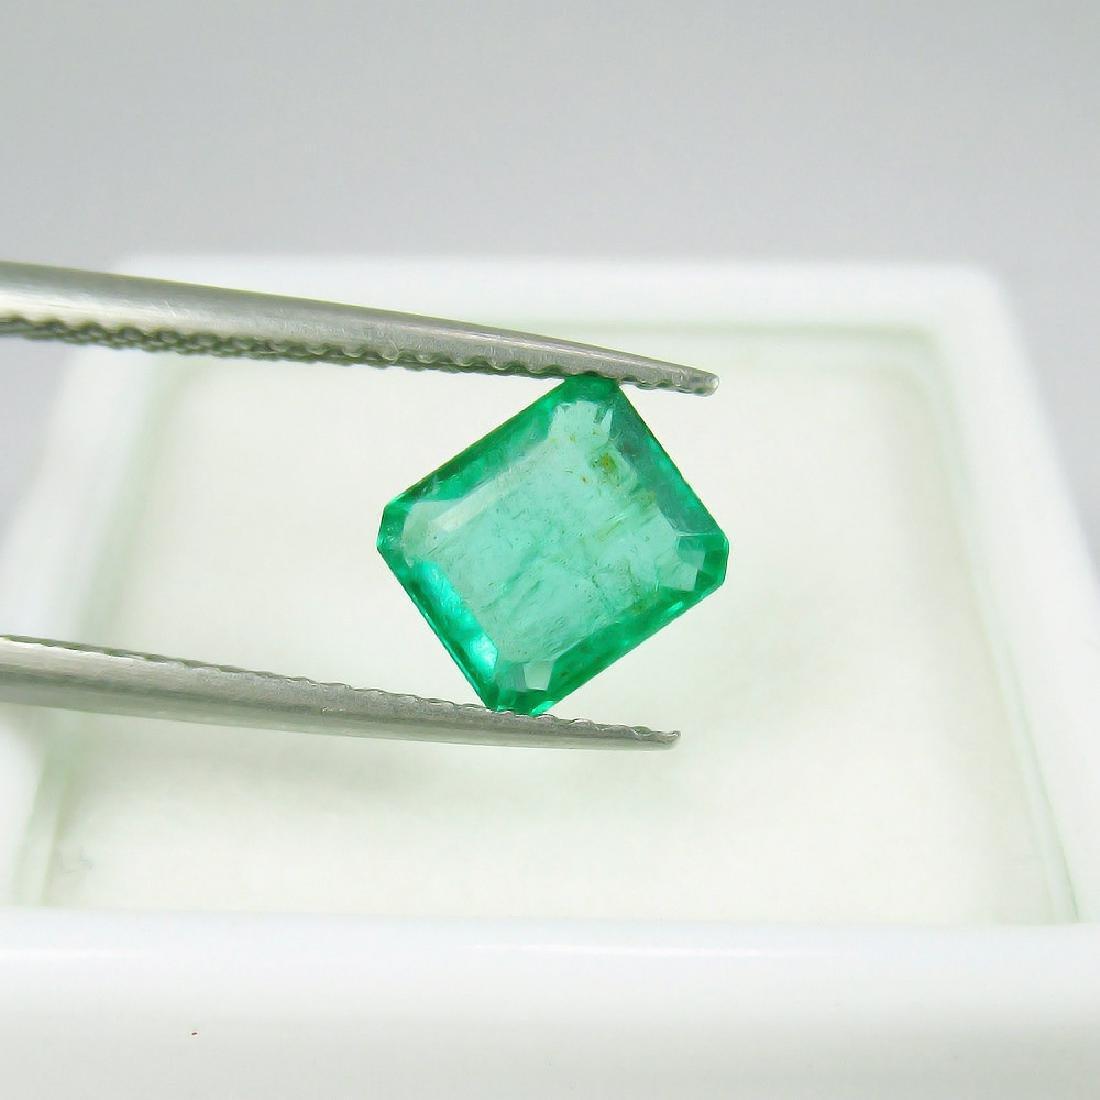 1.17 Carat Natural Zambian Loose Octagon Emerald